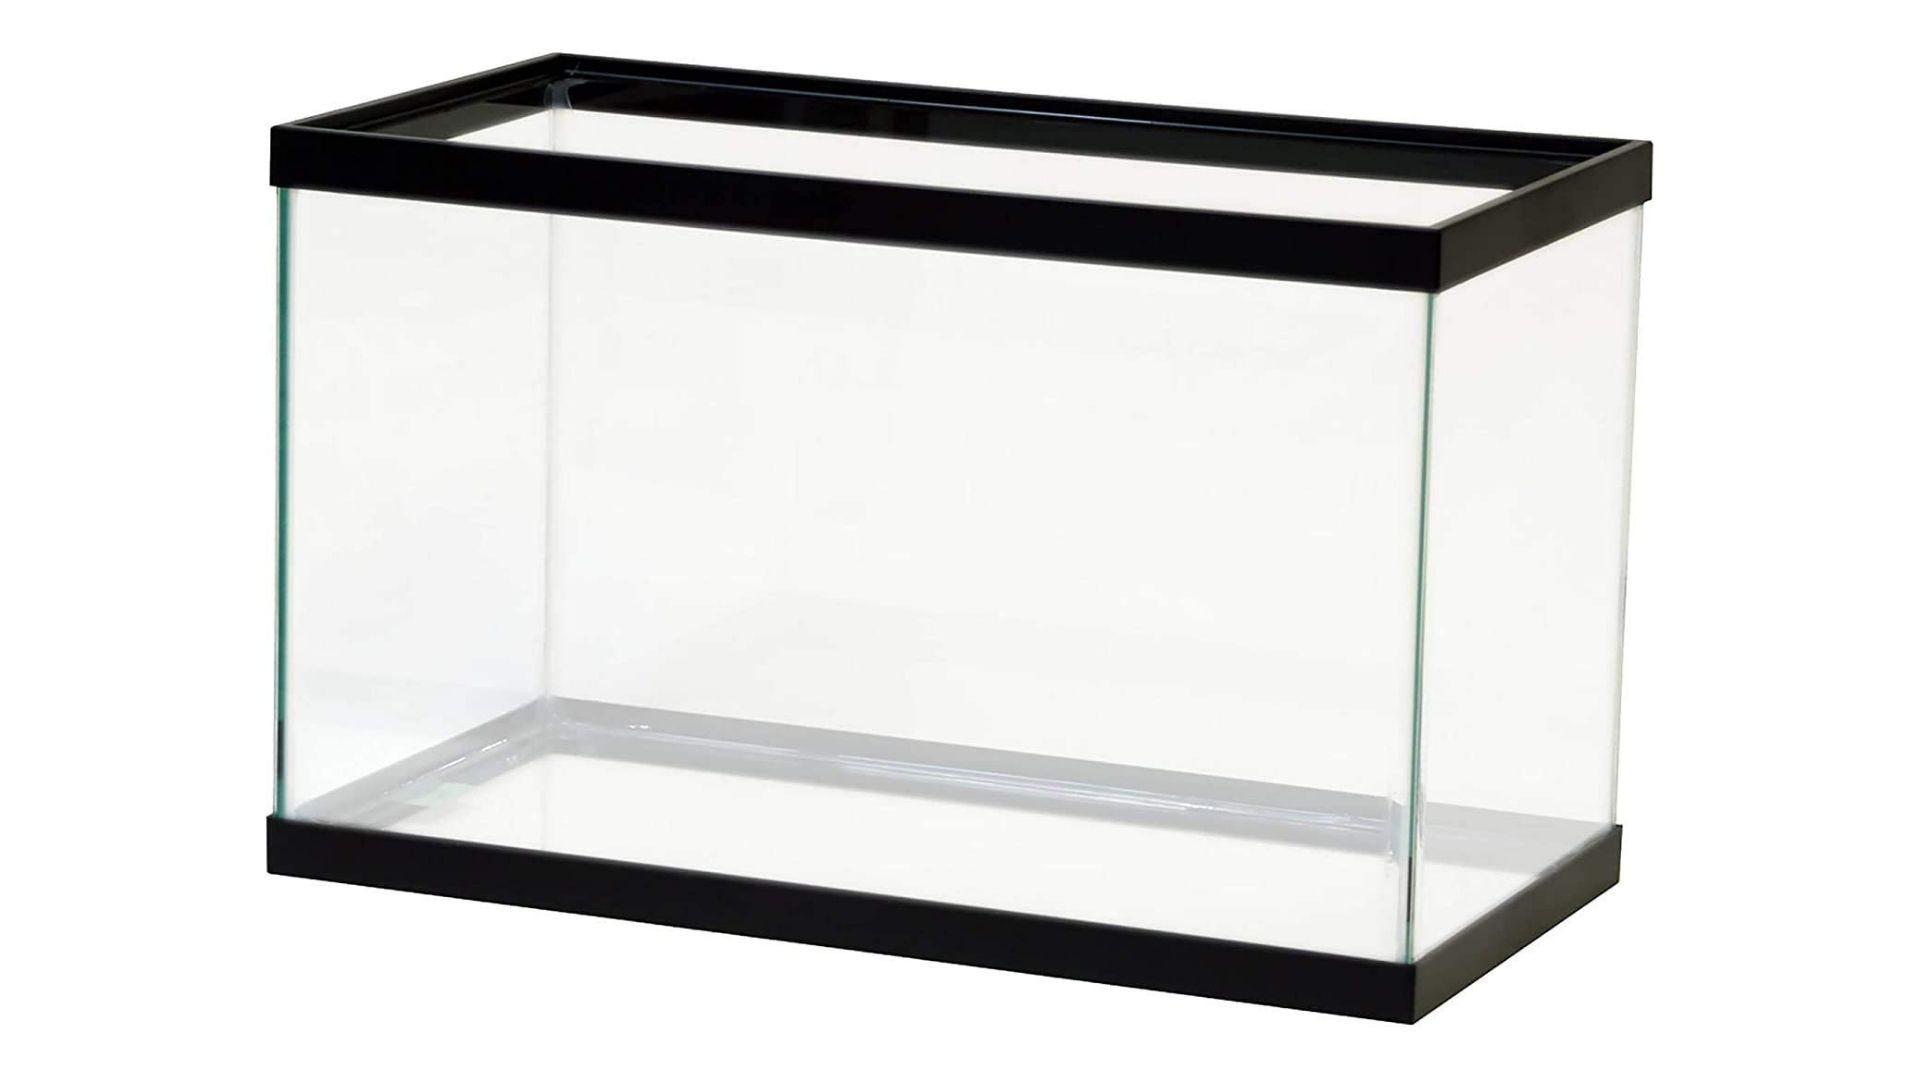 A large glass aquarium